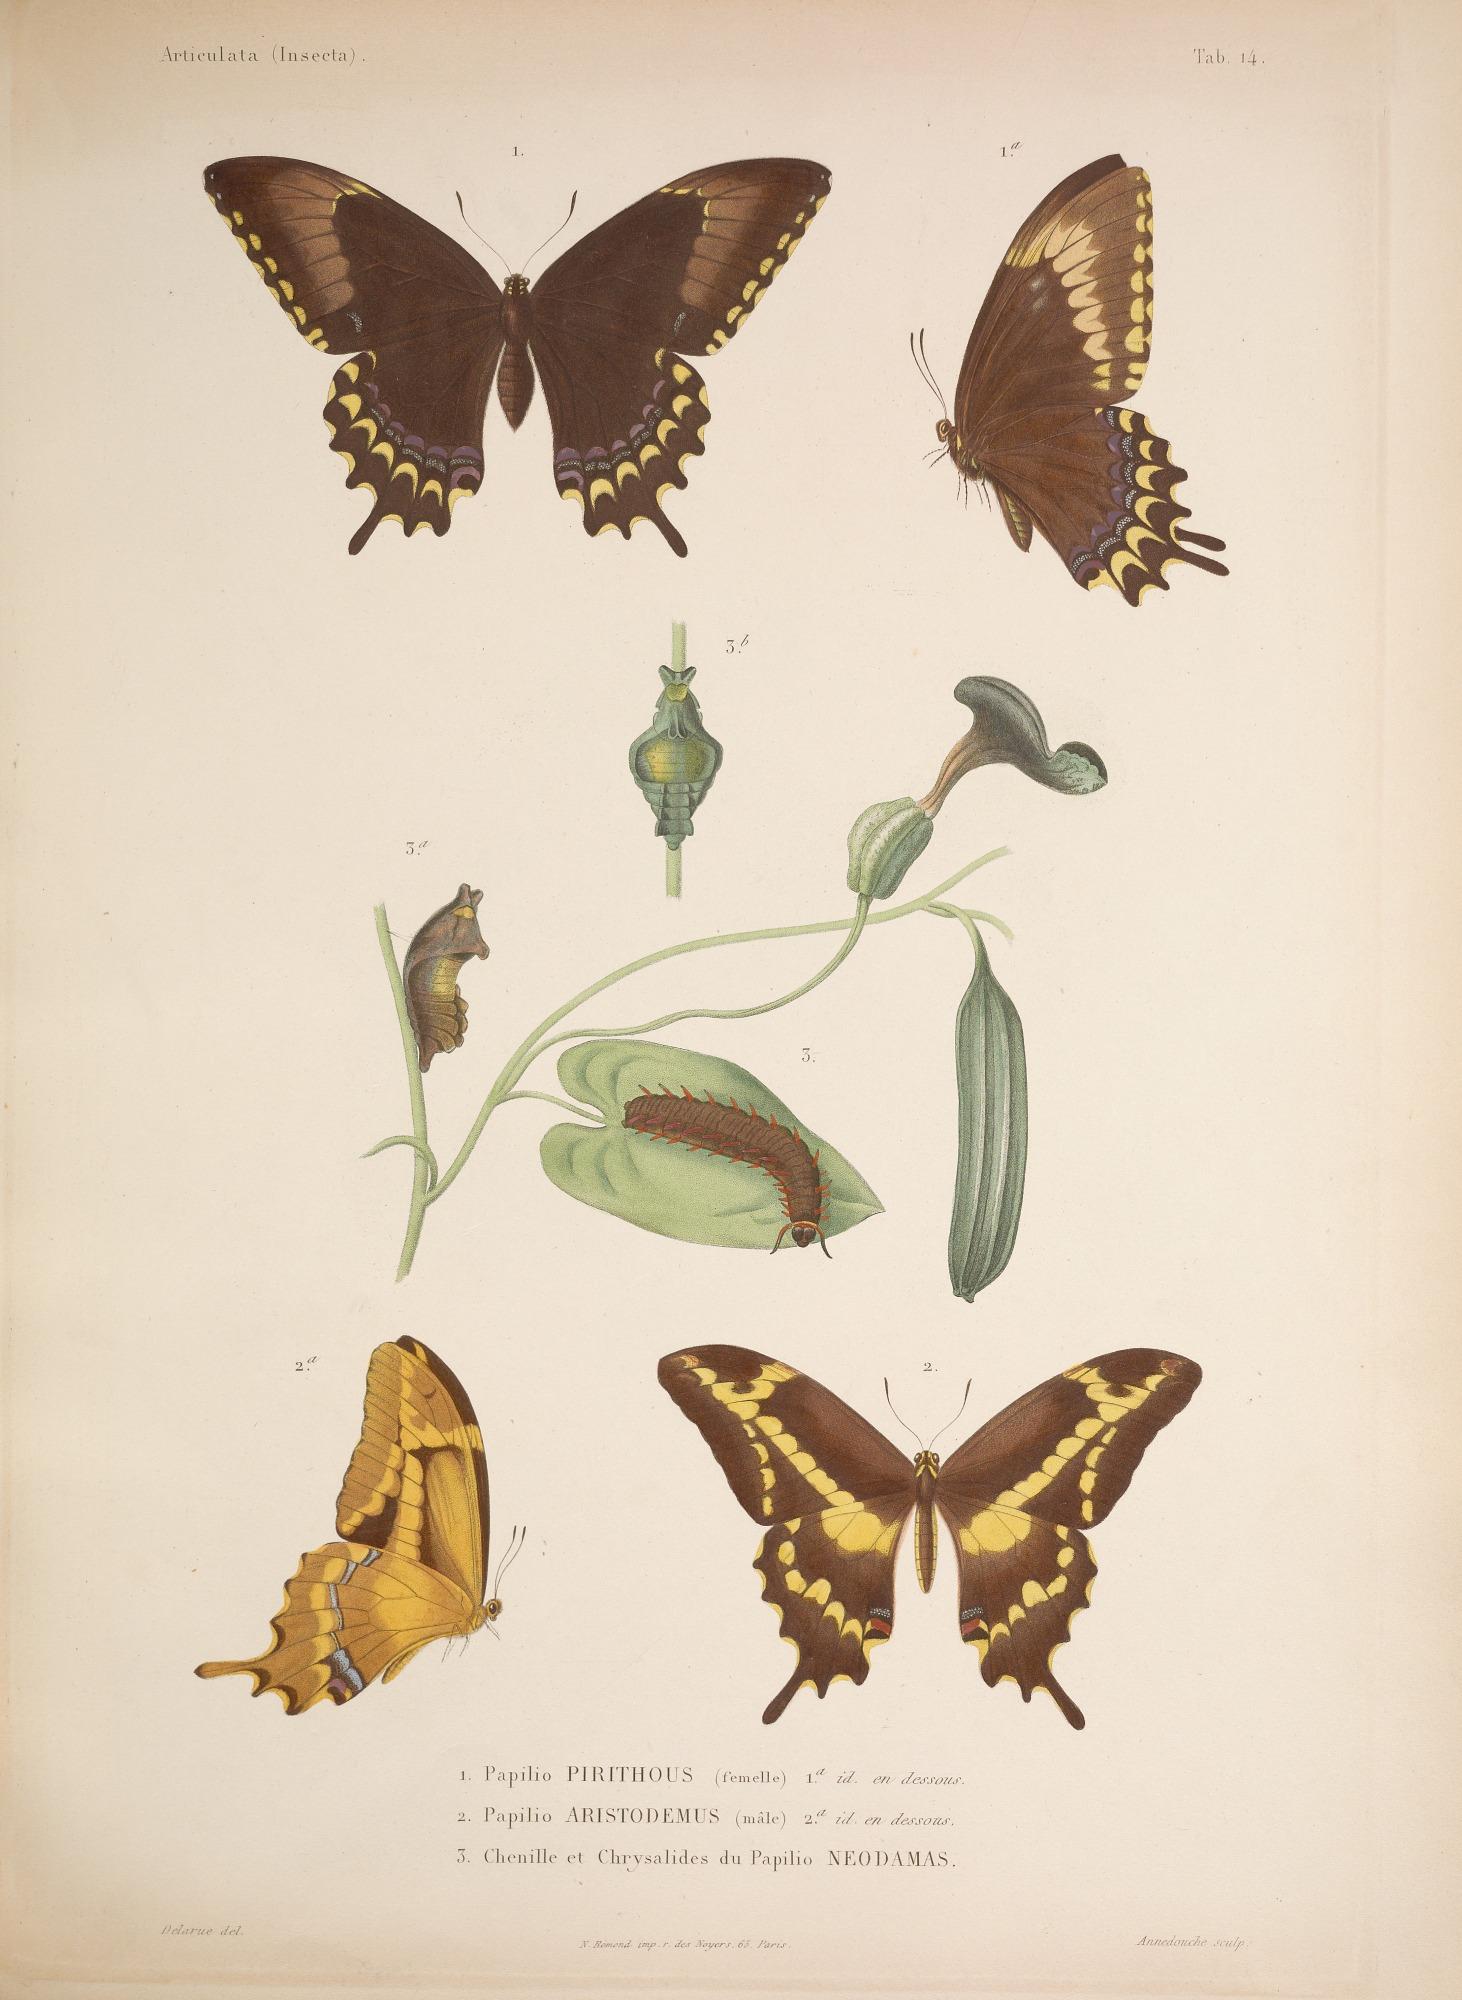 Species and anatomy of butterflies